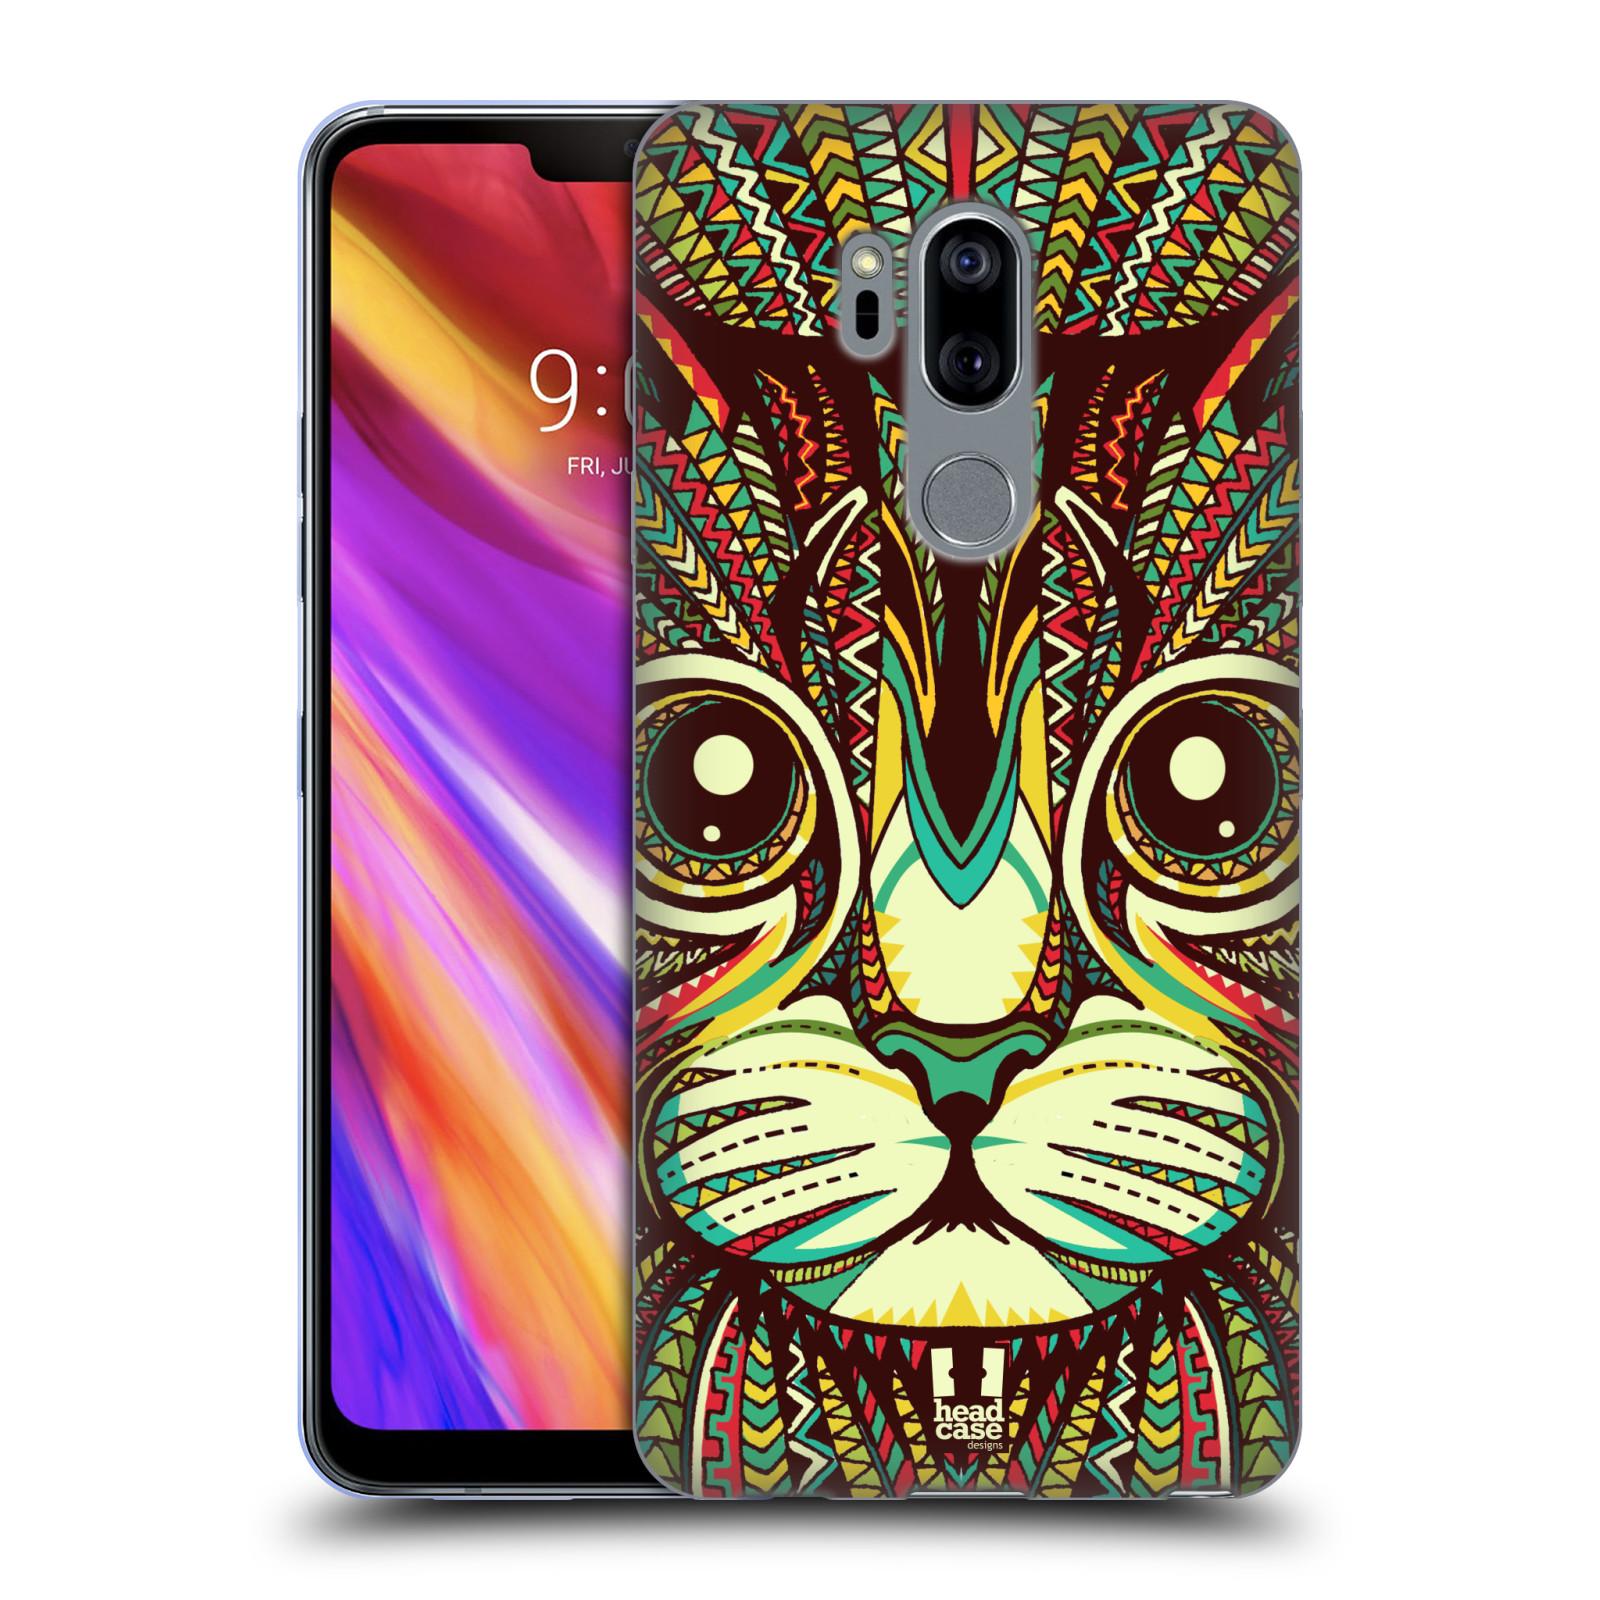 Silikonové pouzdro na mobil LG G7 ThinQ - Head Case - AZTEC KOČKA